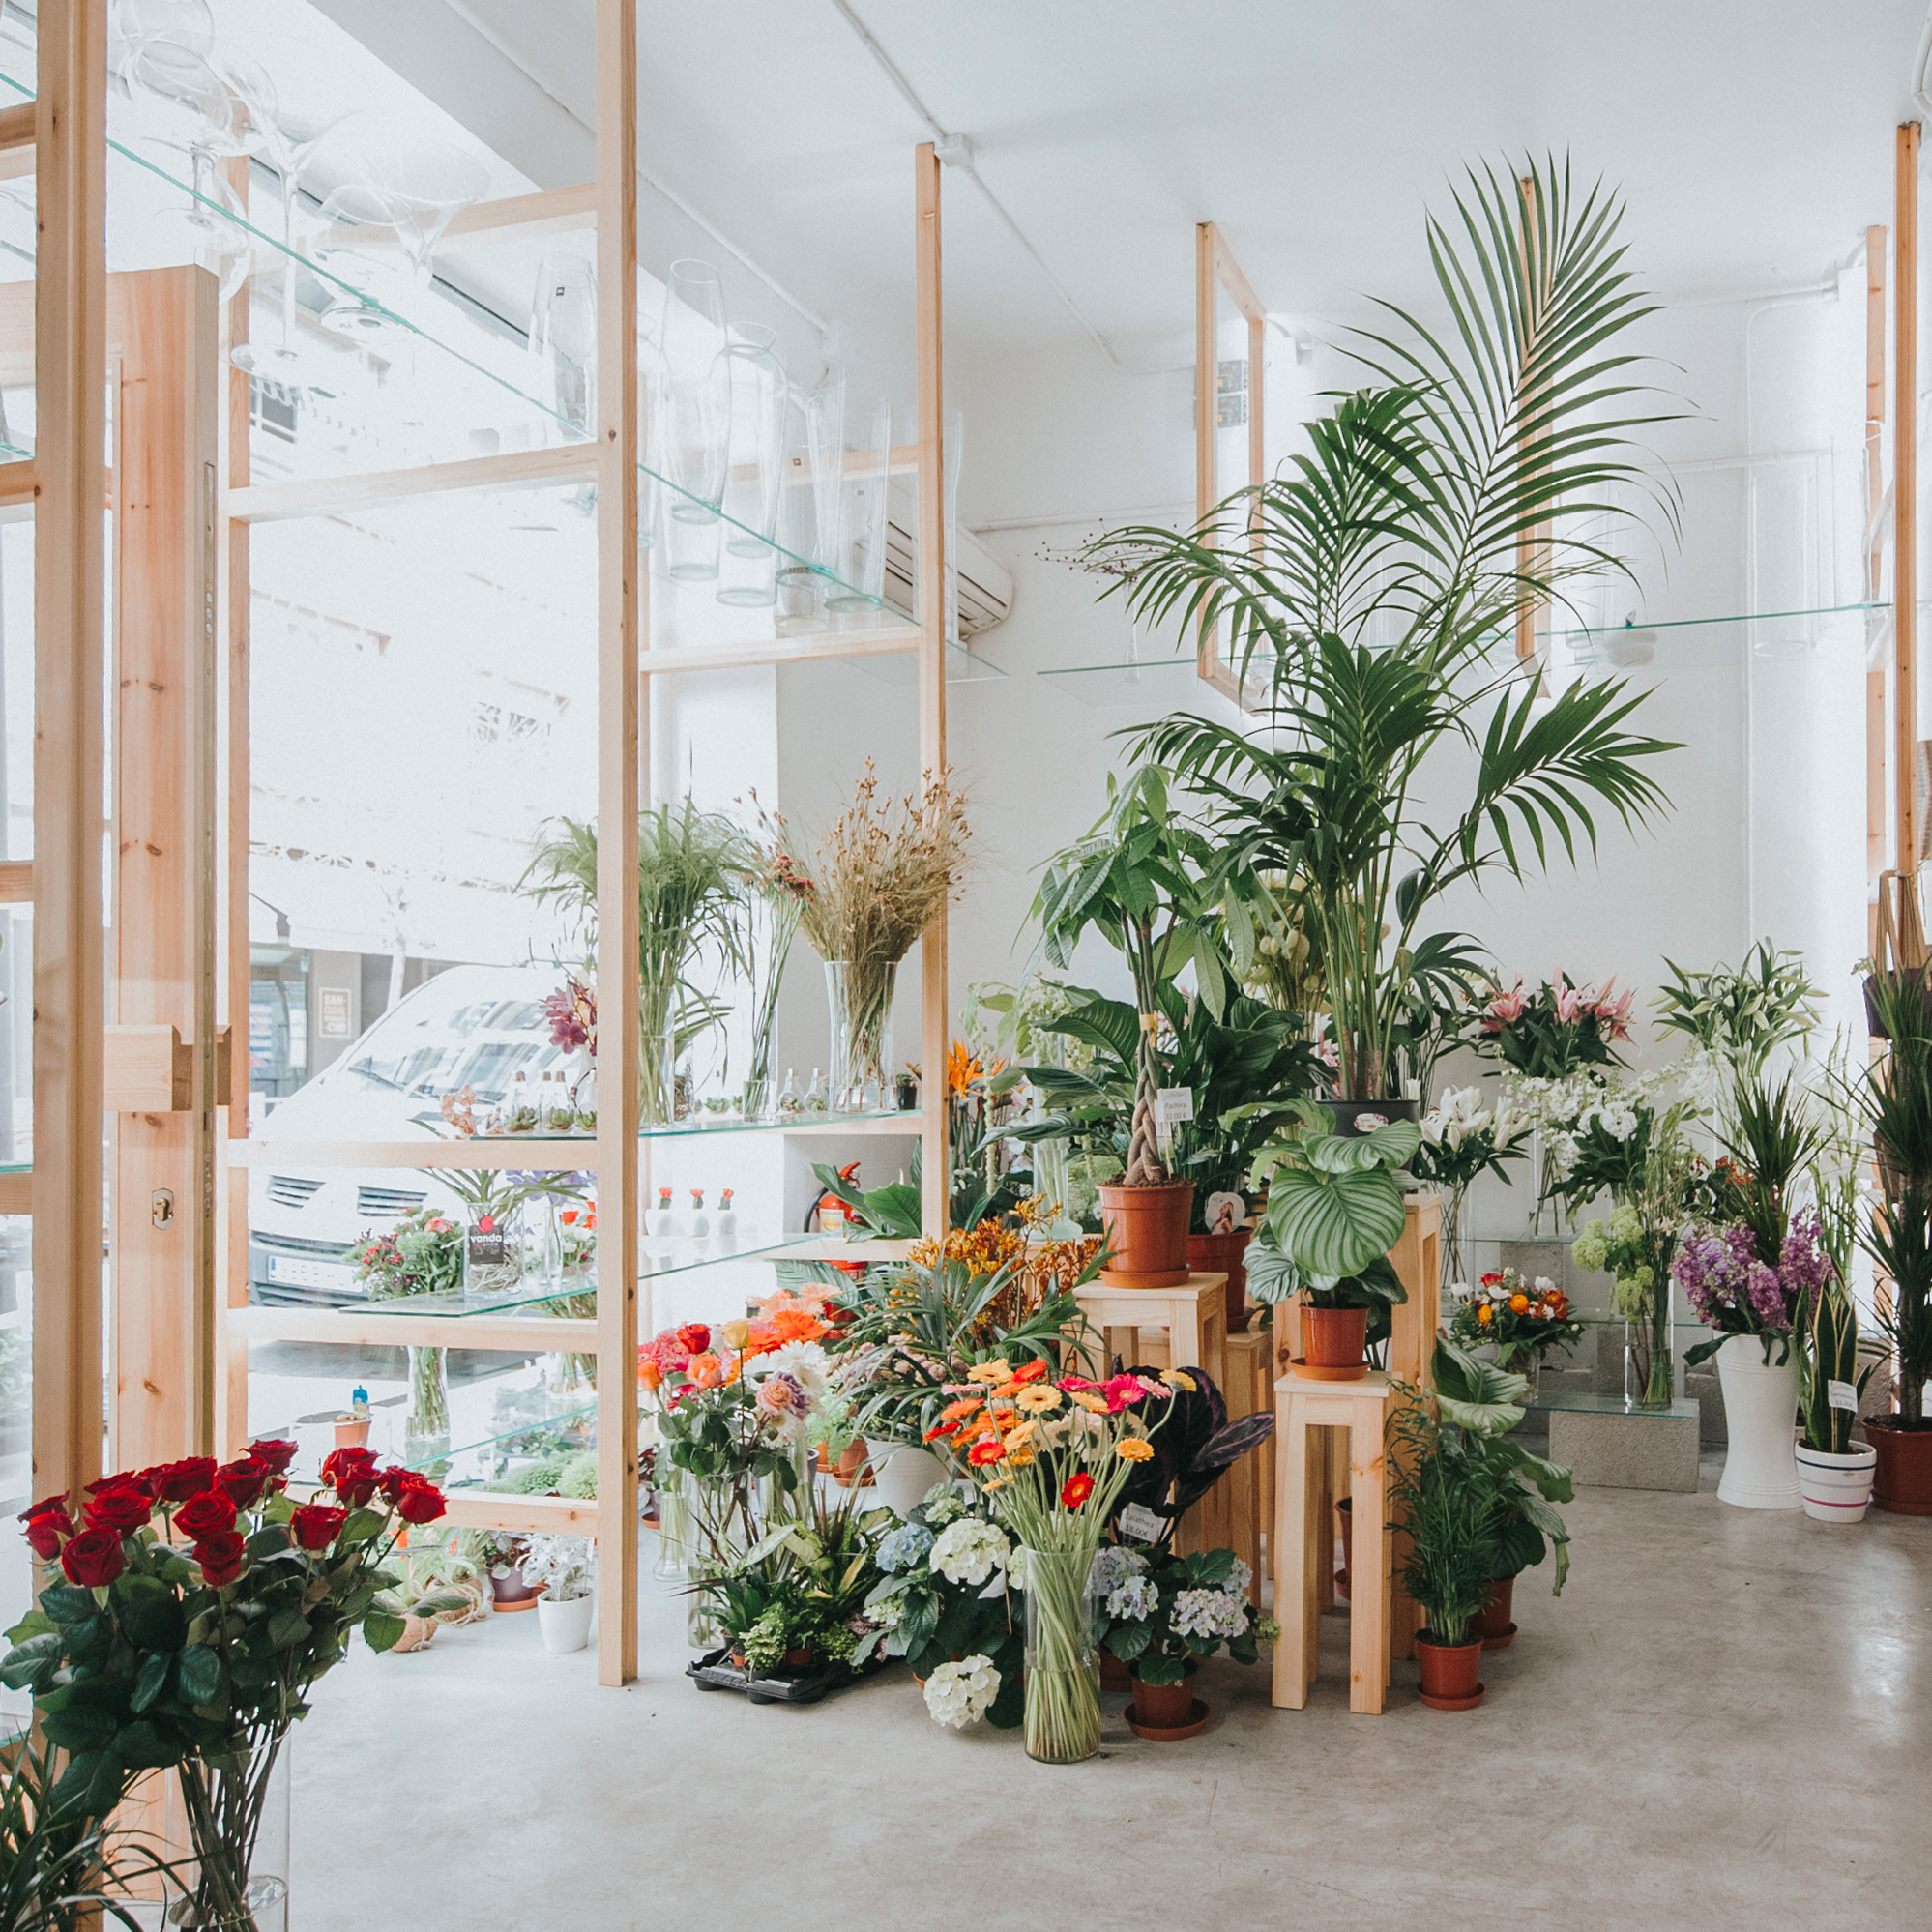 Flower Design Shop: Orchids And Ladders / SERRANO+BAQUERO Arquitectos